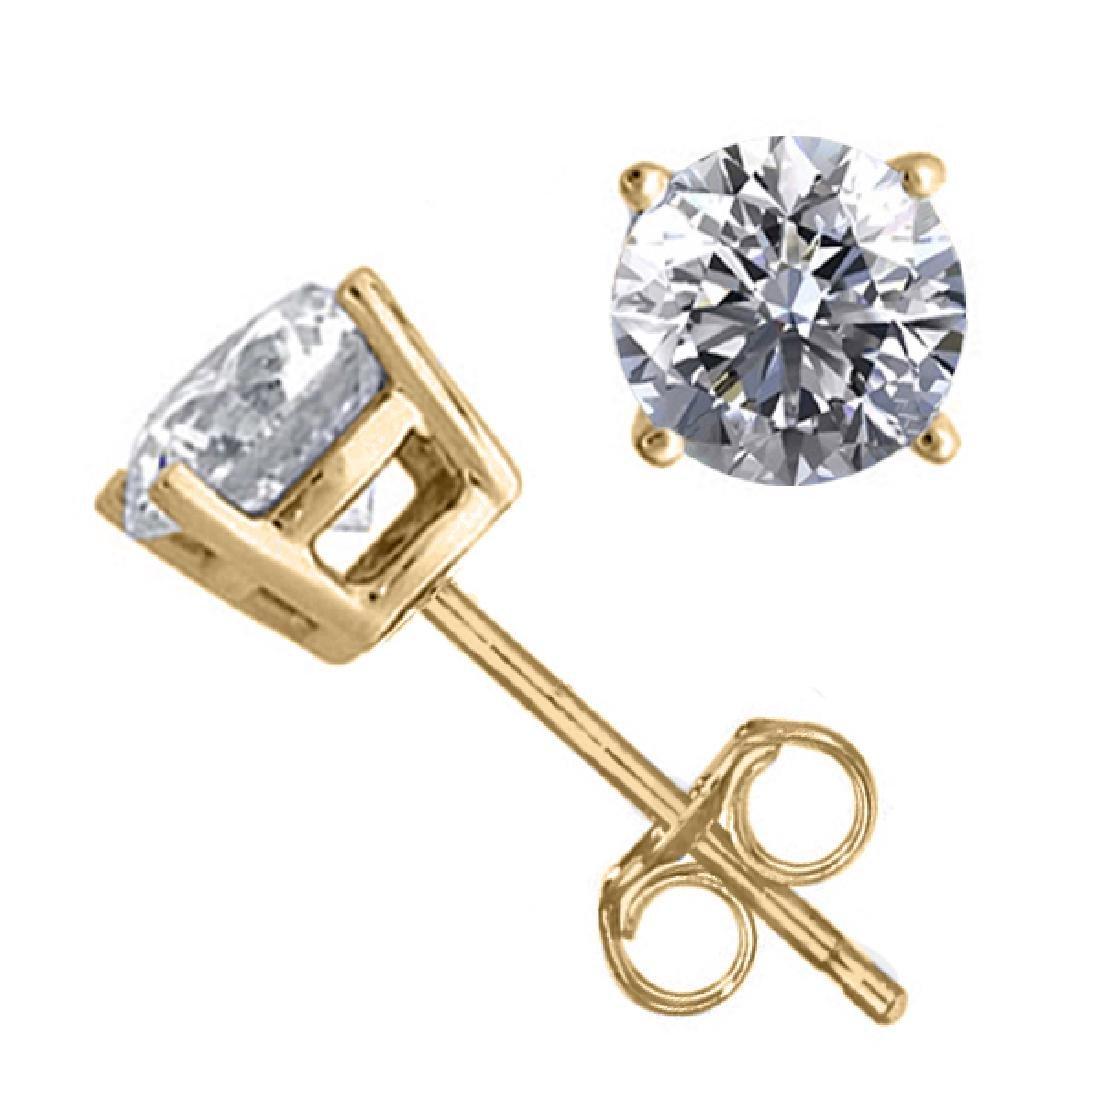 14K Yellow Gold Jewelry 1.06 ctw Natural Diamond Stud